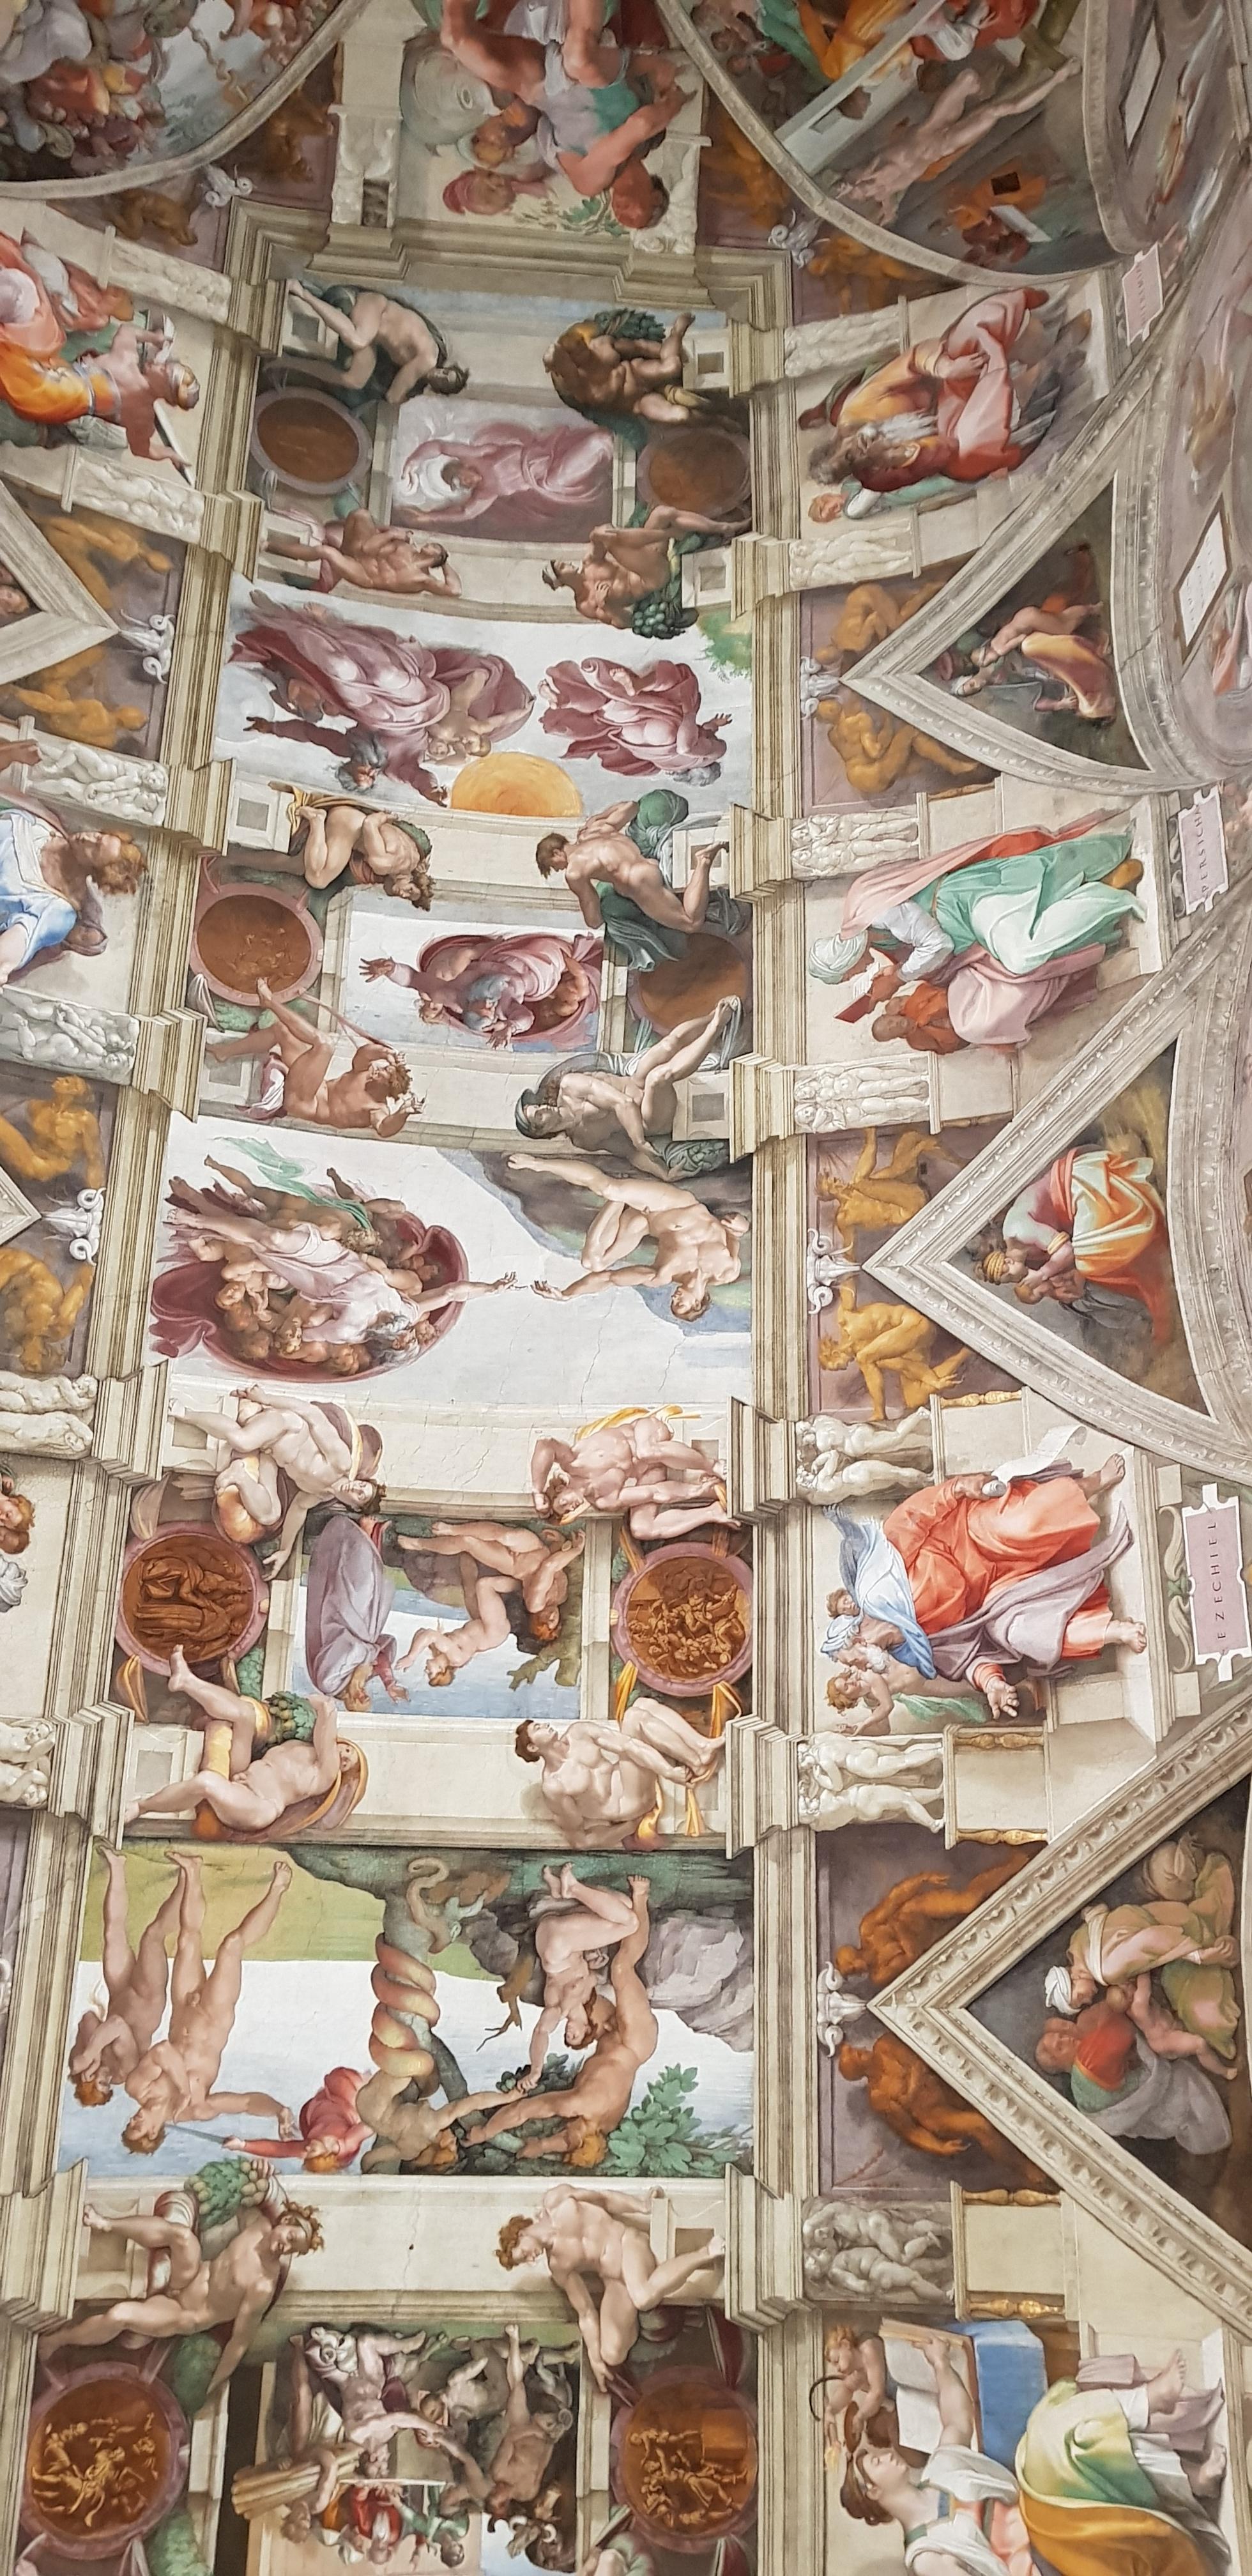 Sistine Chapel in the Vatican